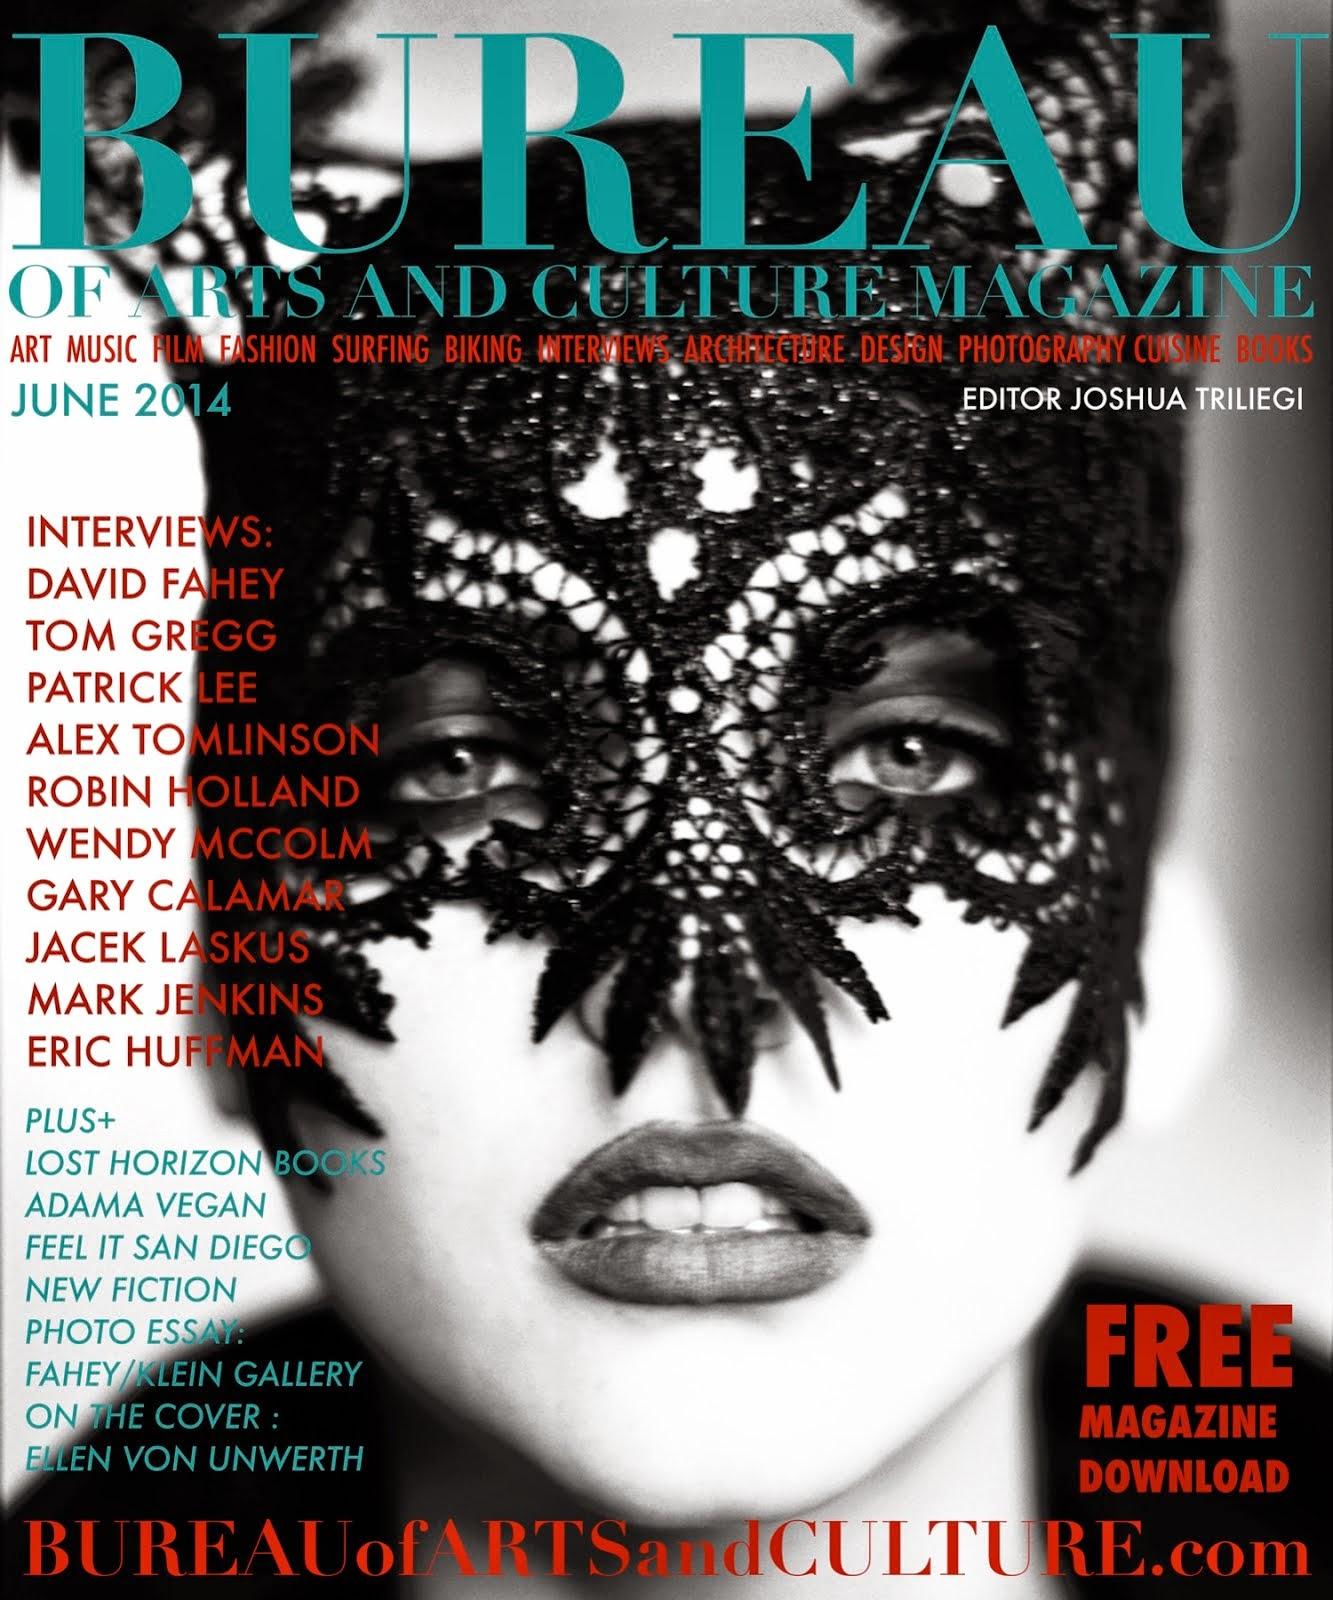 JUNE 2014 EDITION